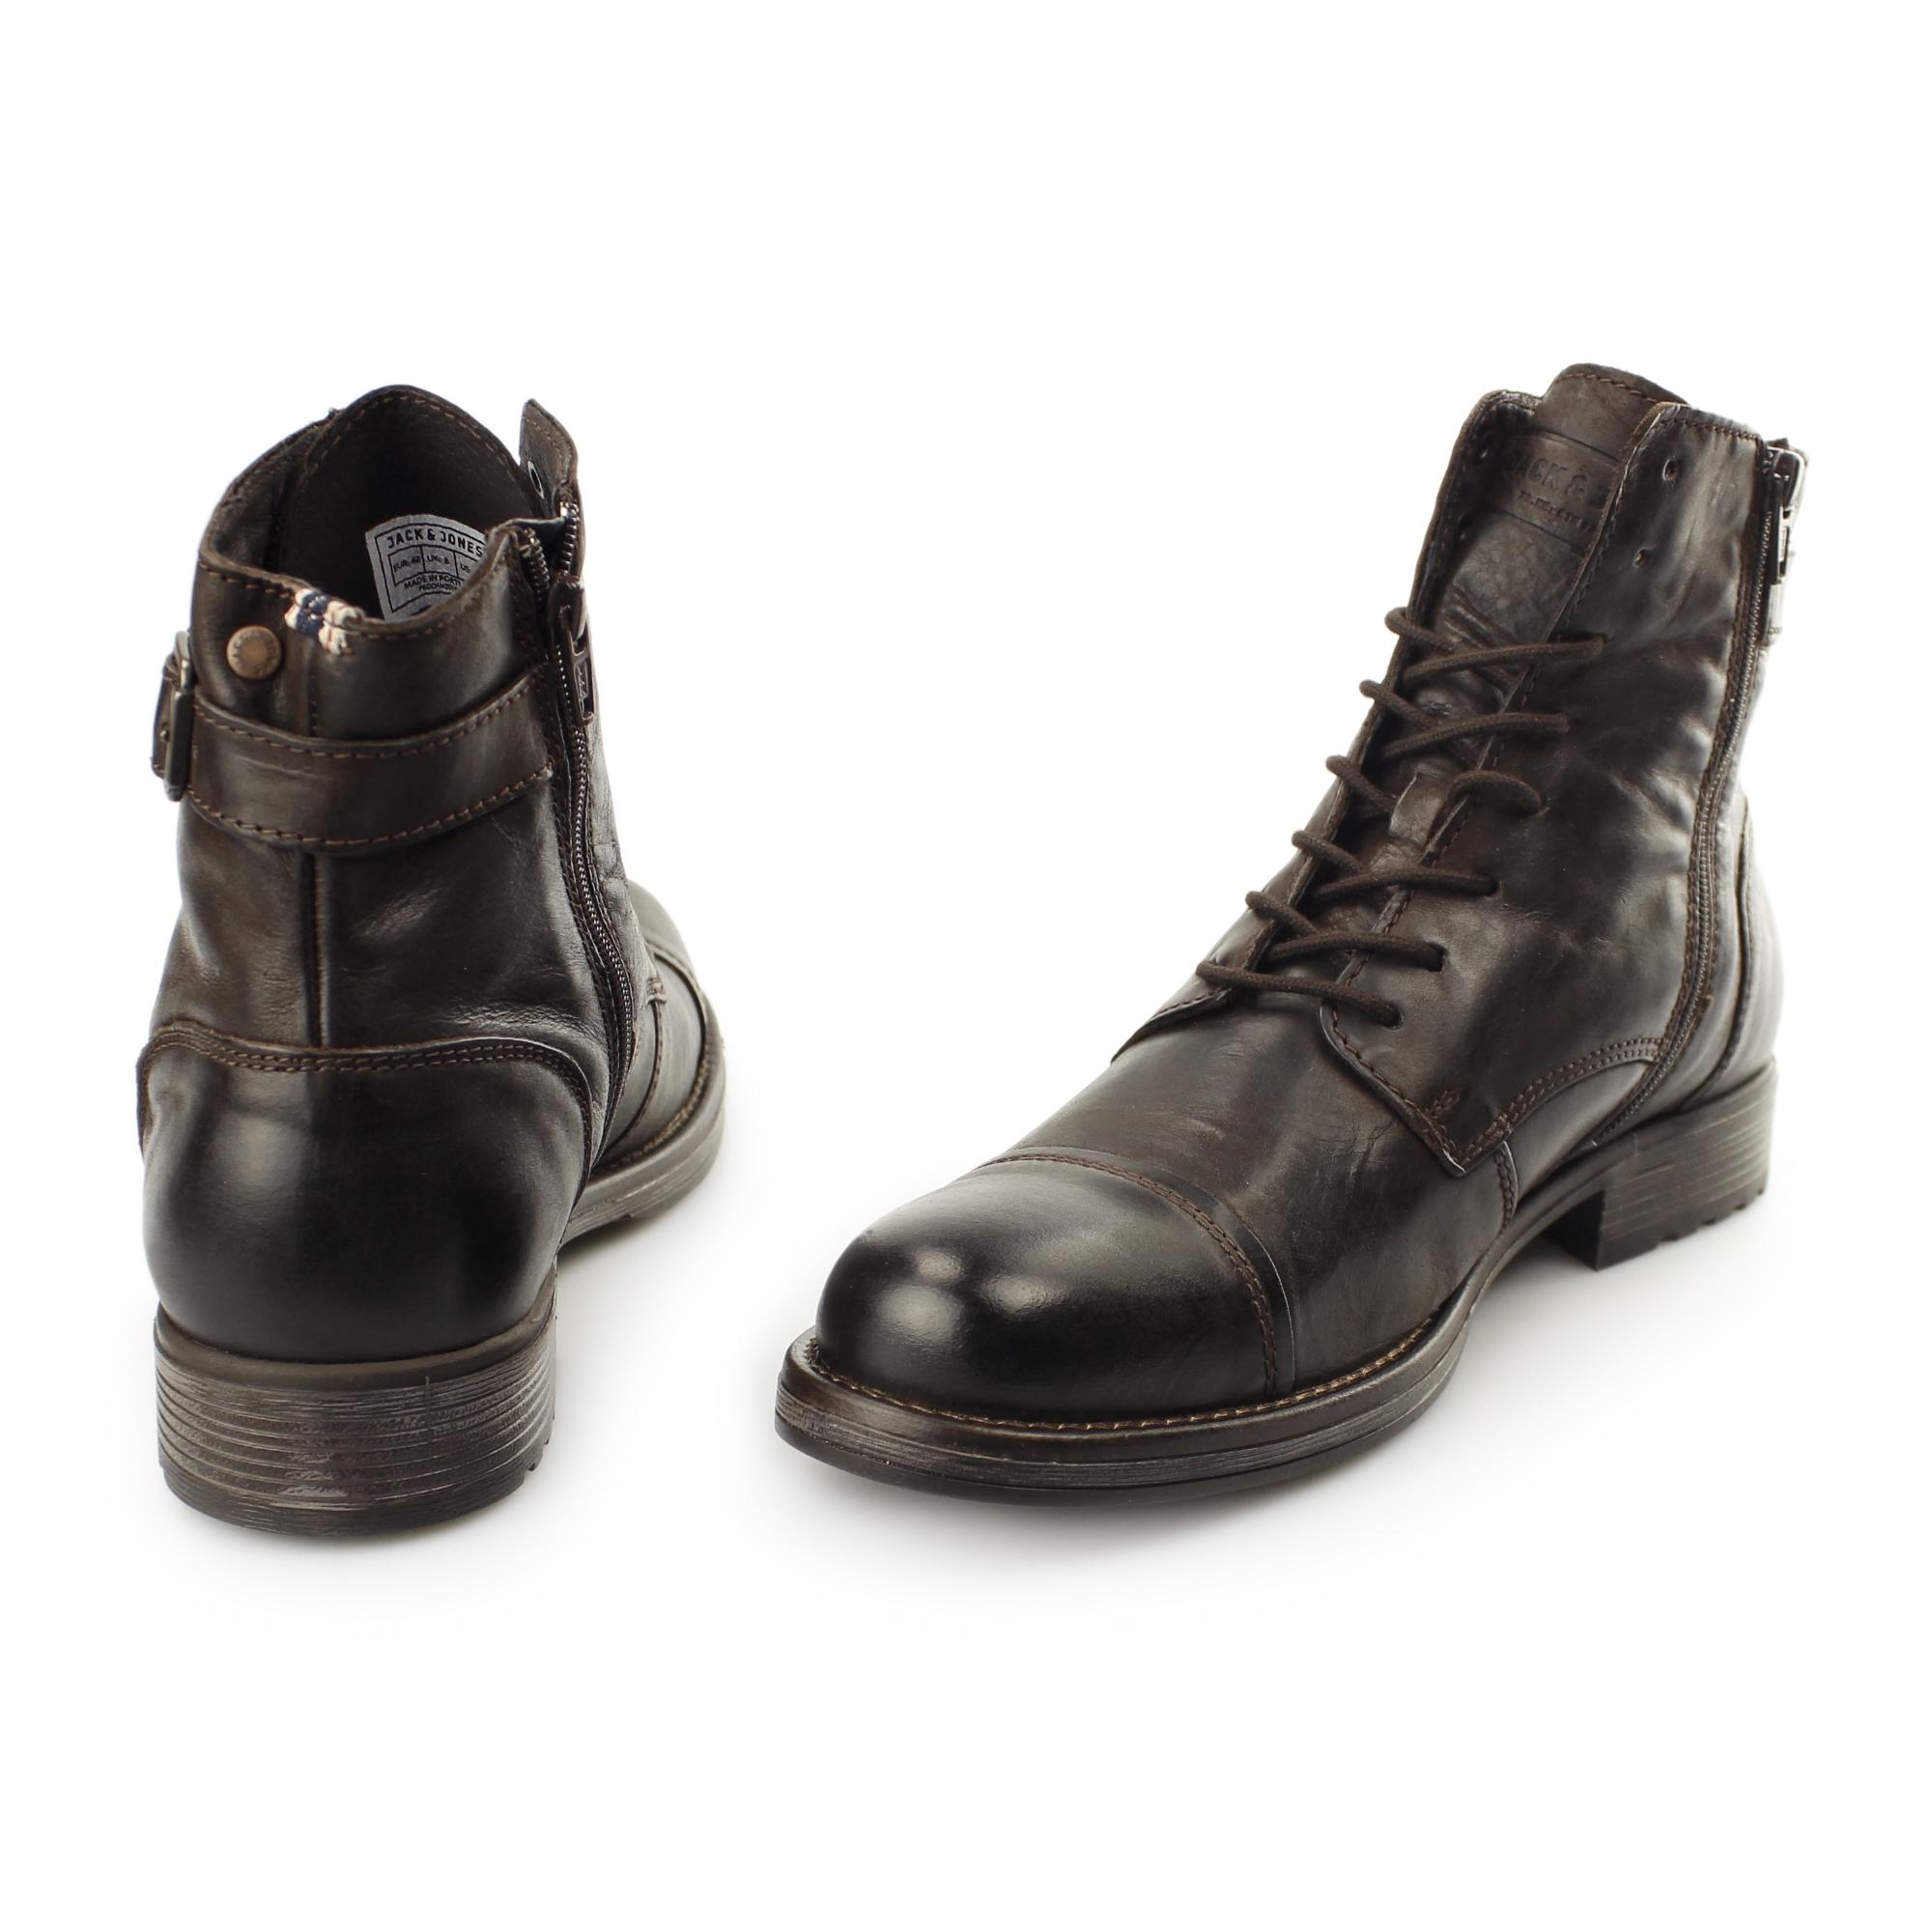 60fb7baa6264 boots homme jack and jones